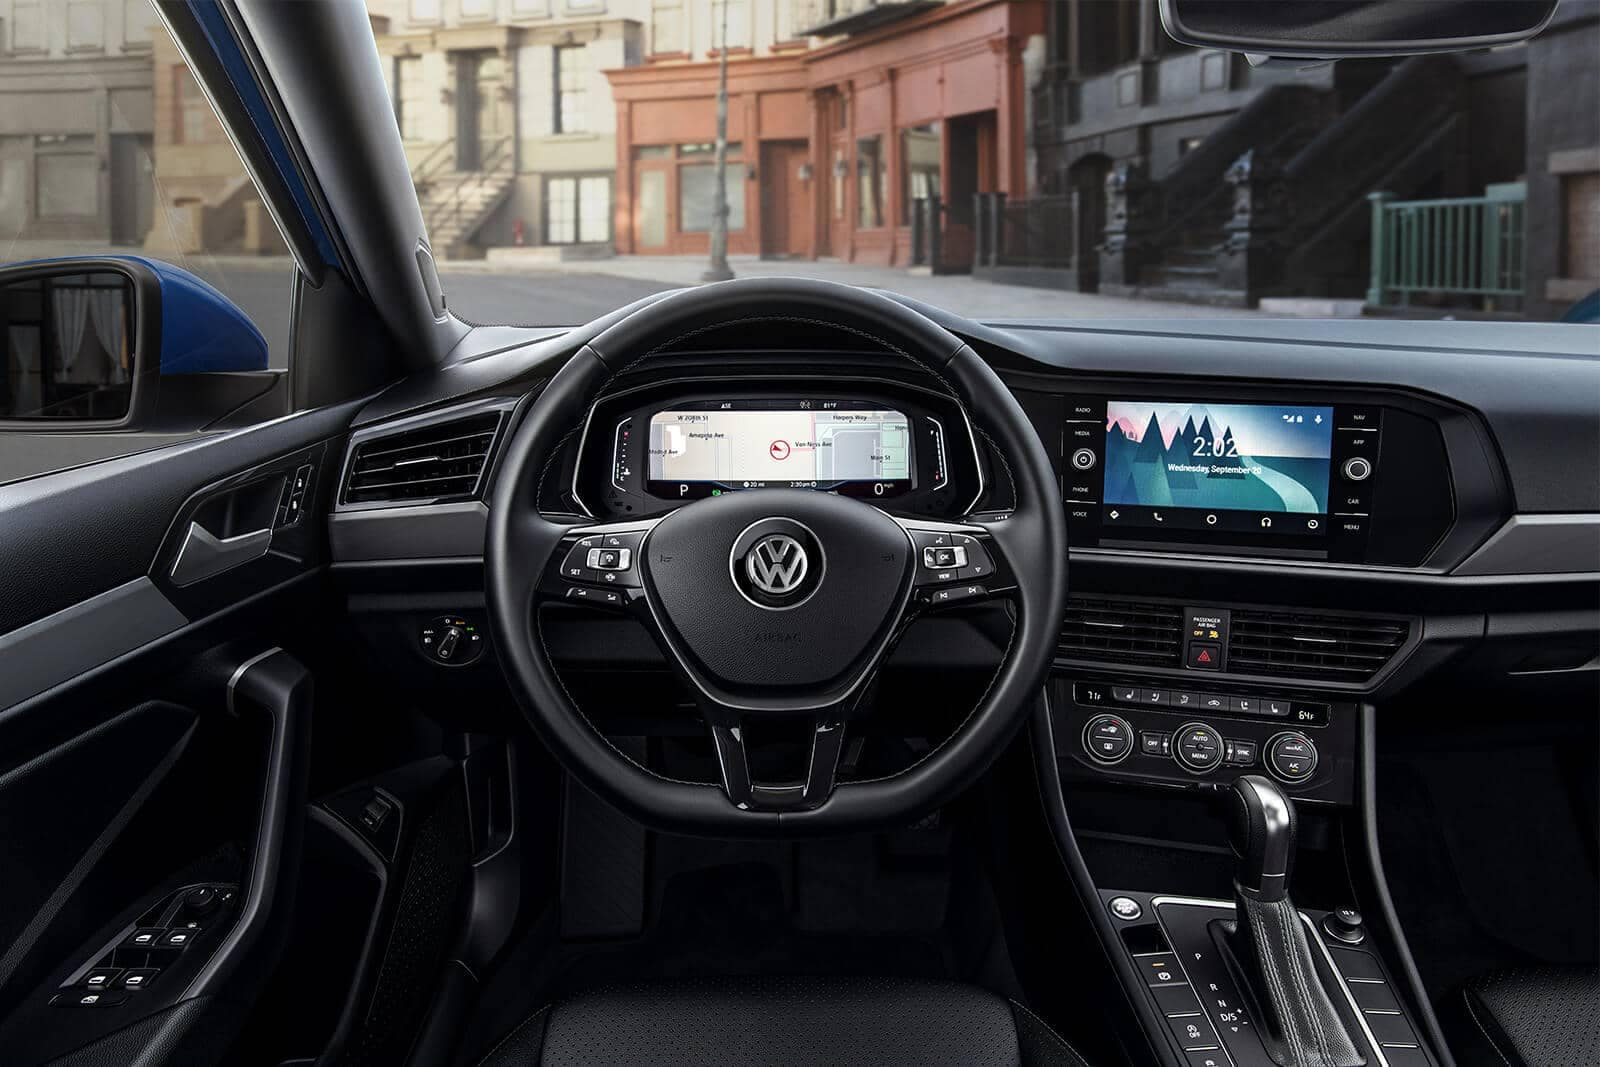 2019 Volkswagen Jetta SEL Premium titan black leather interior dashboard